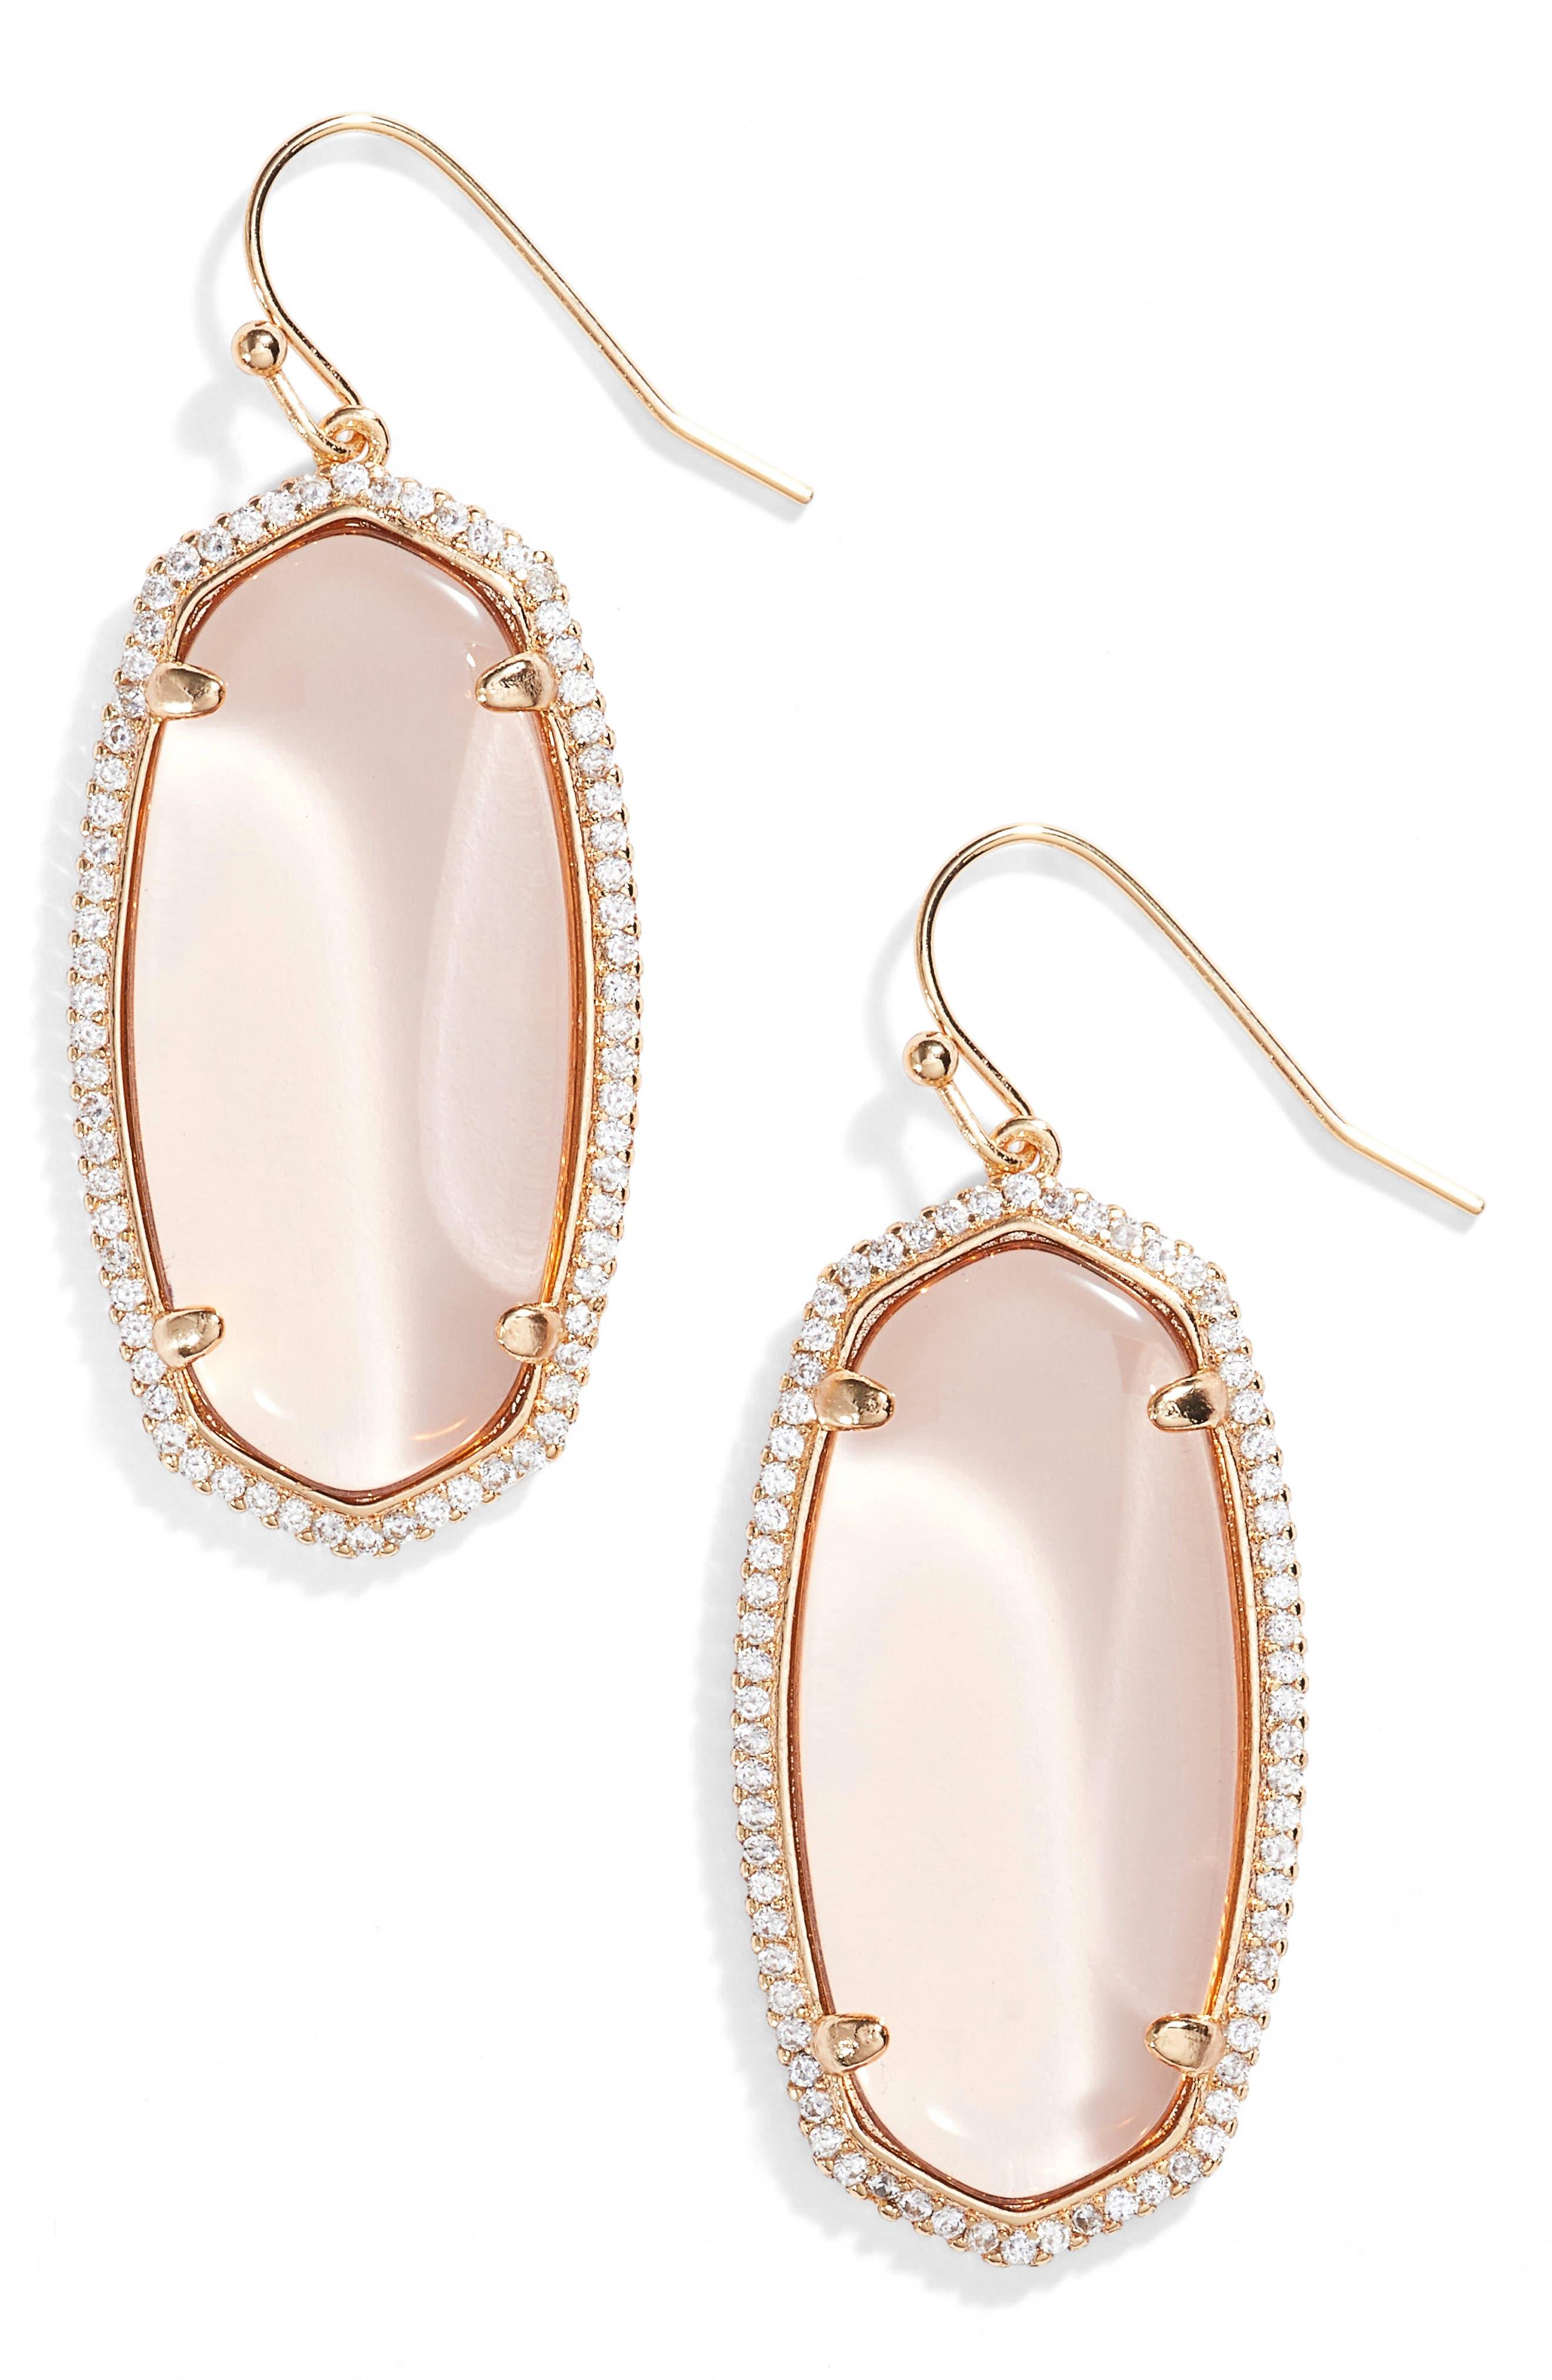 Elle Pavé Drop Earrings,                             Main thumbnail 1, color,                             Peach Clear Glass/ Rose Gold